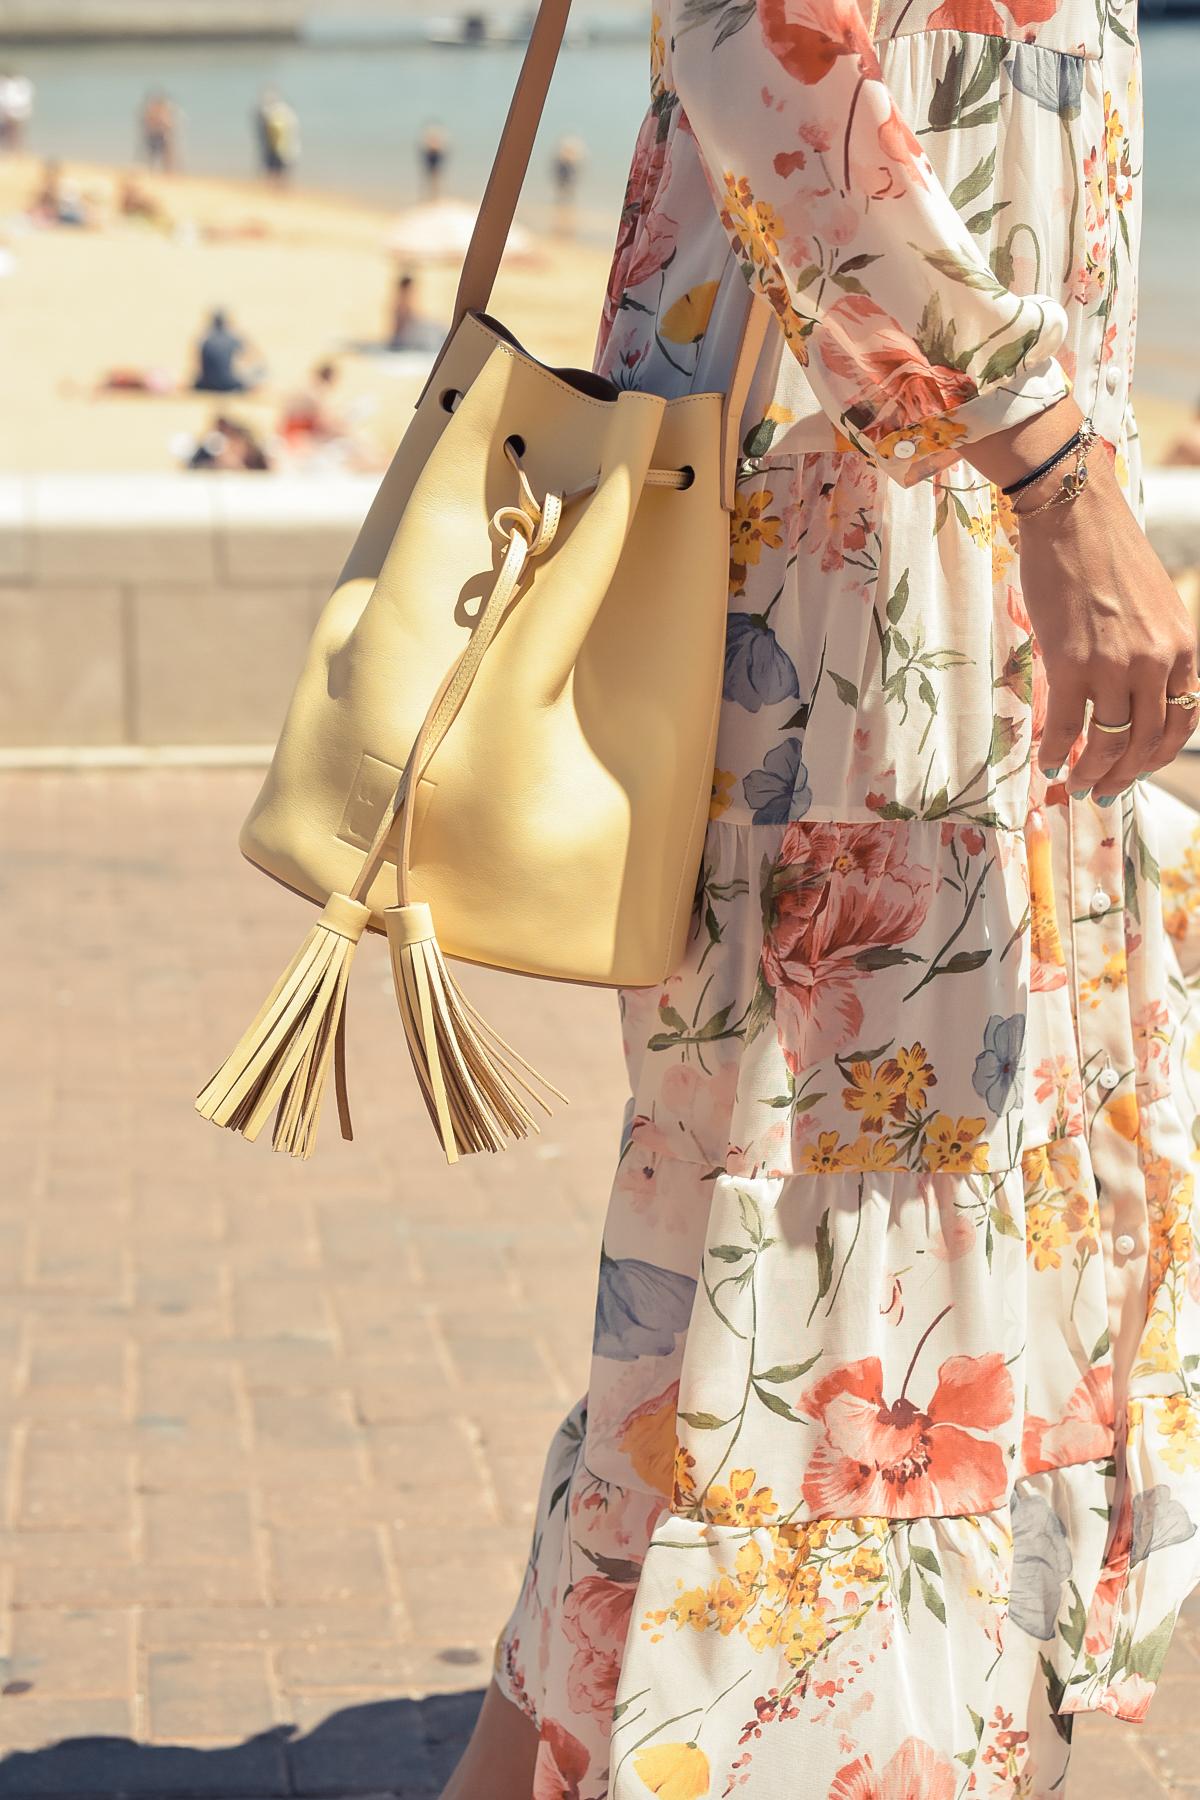 10-el-blog-de-silvia-viaje-Cascais-Estoril-vestido-flores